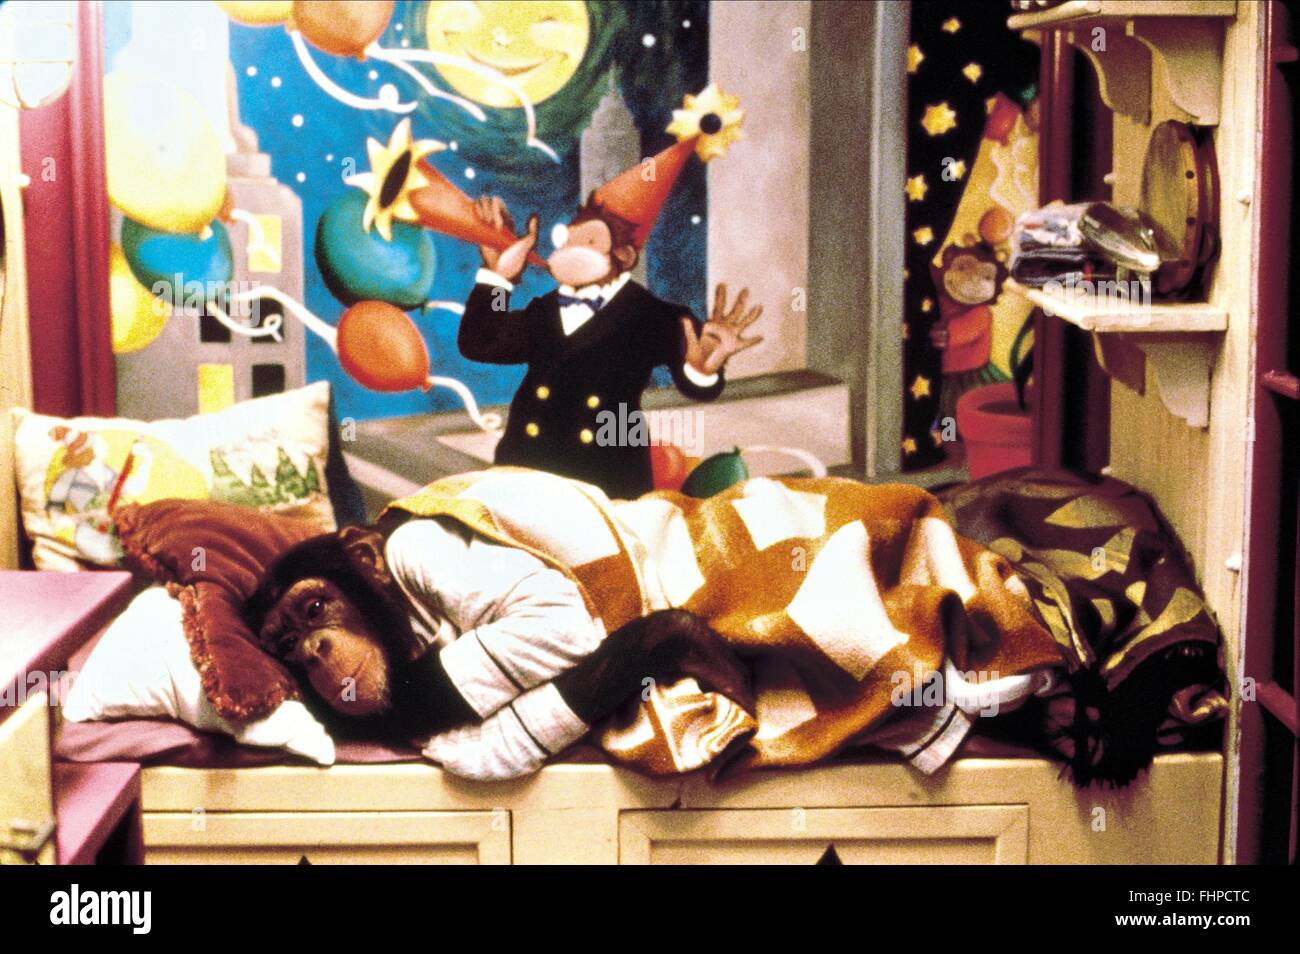 El chimpancé Buddy (1997) Imagen De Stock